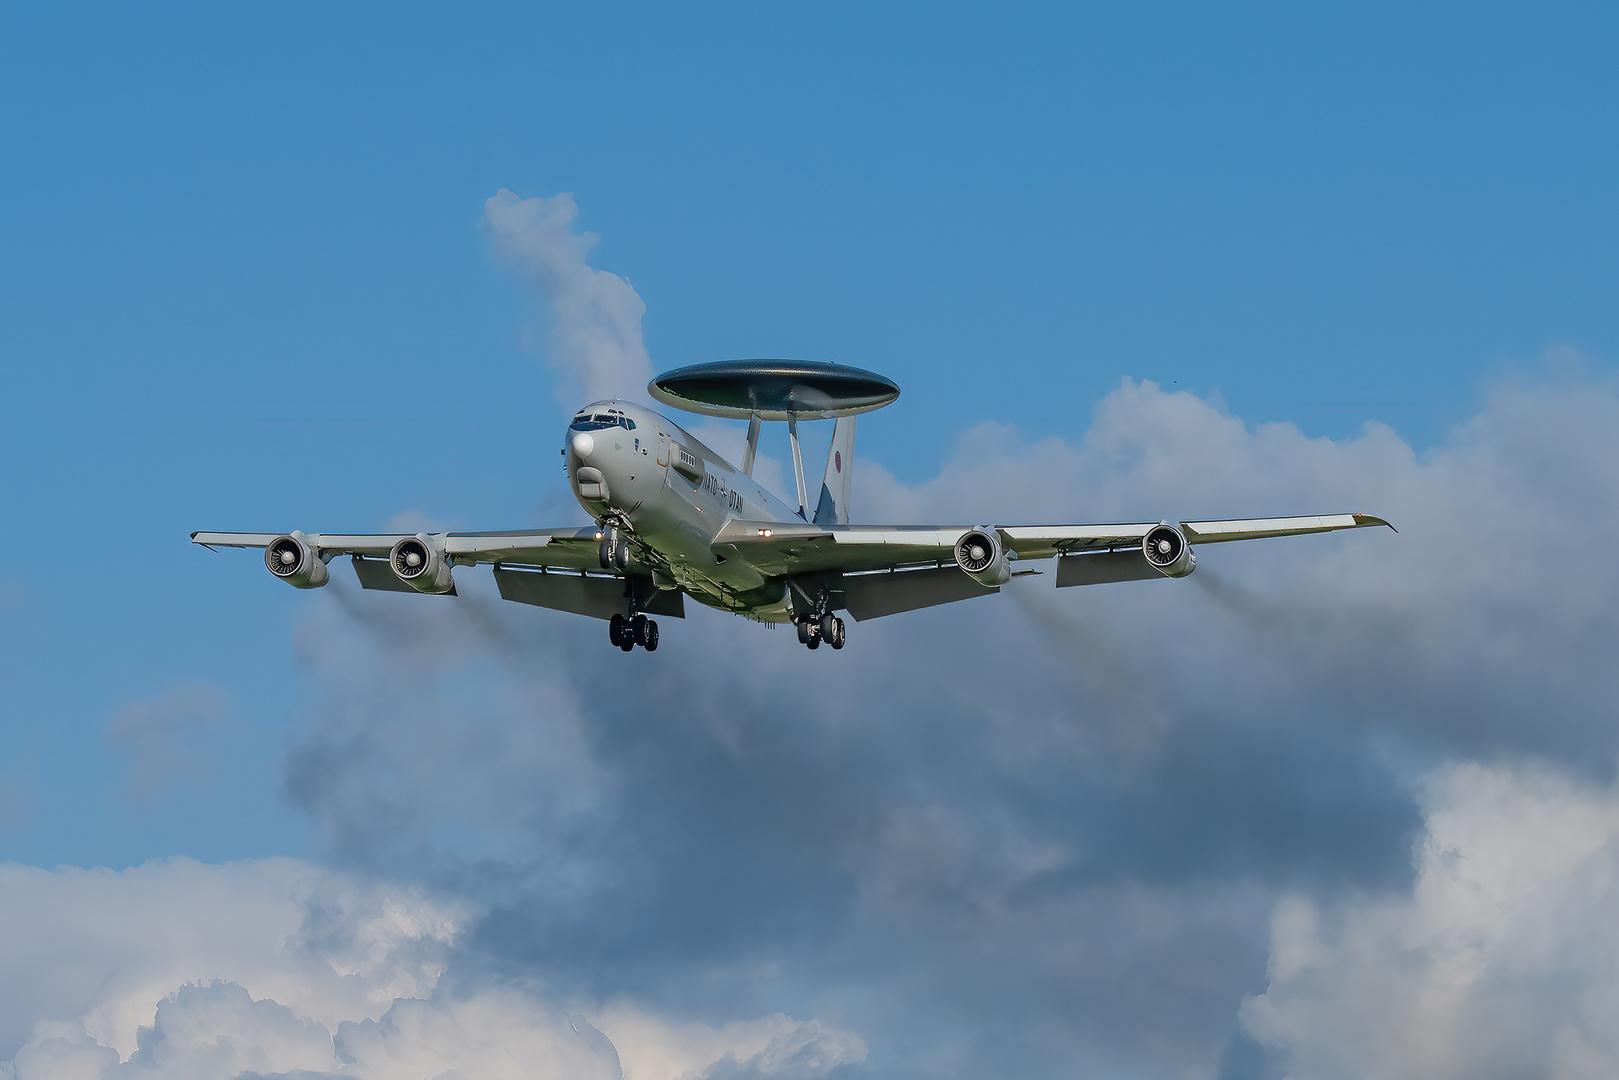 AWAC I Boing 707-320